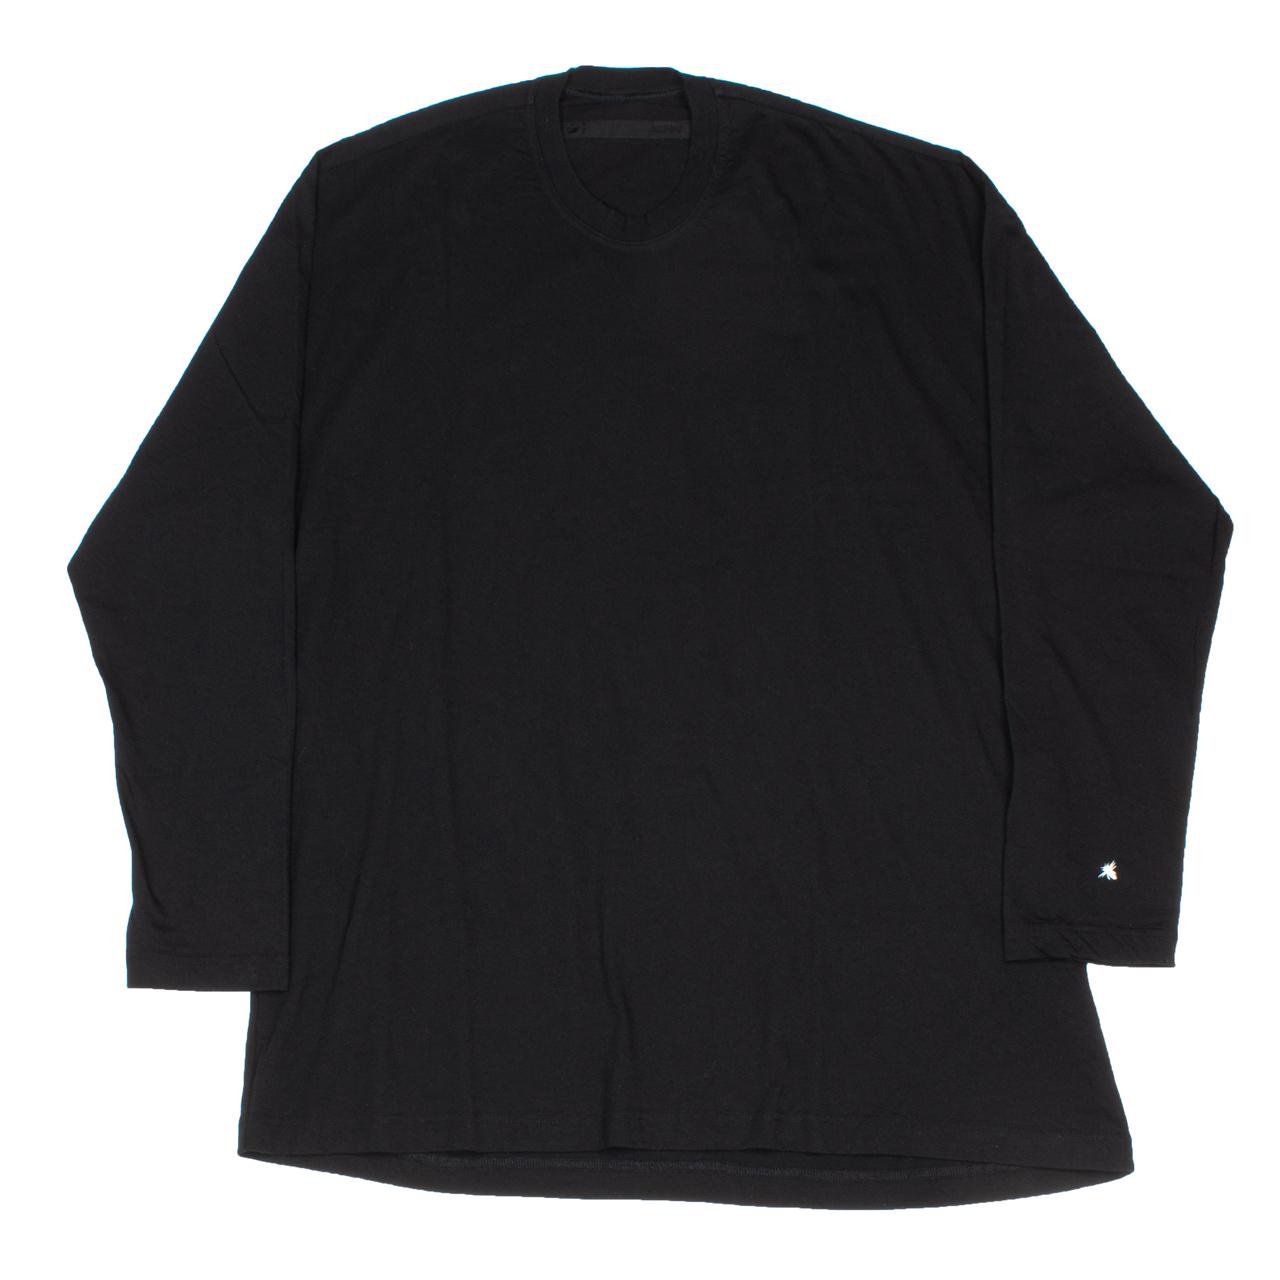 720CPM7-BLACK / バックプリント ロングスリーブ Tシャツ